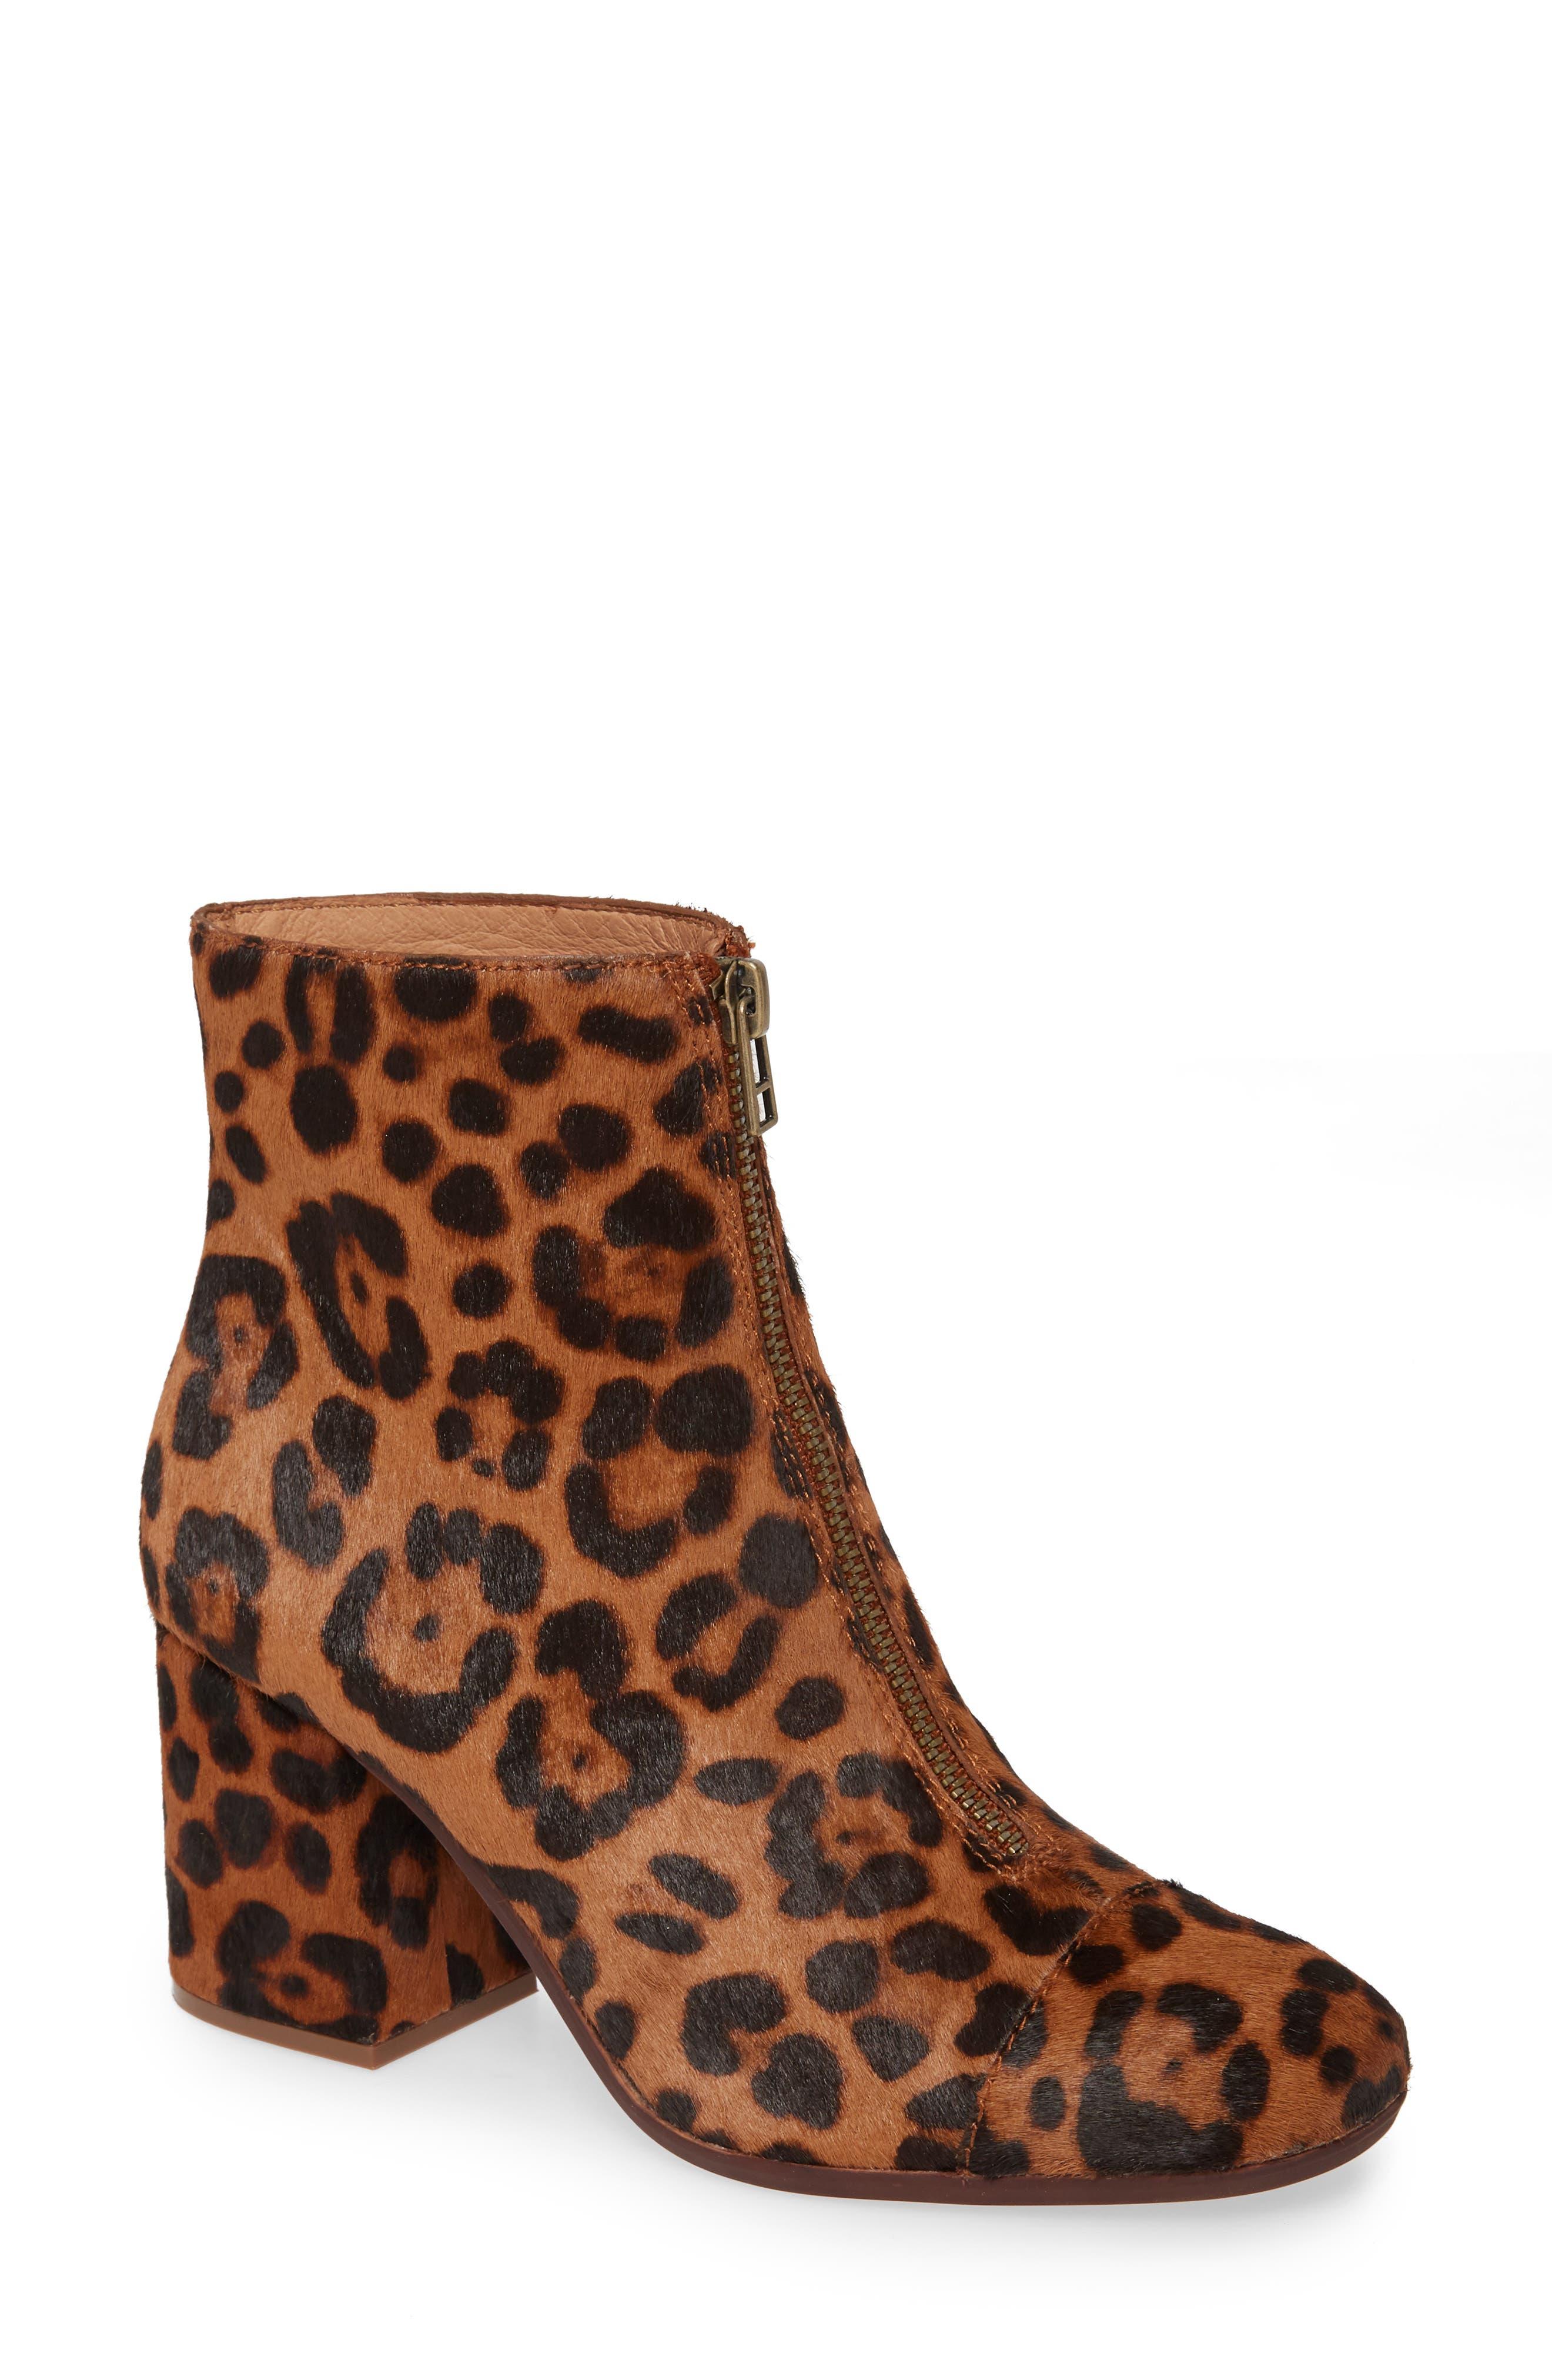 The Amalia Leopard Print Genuine Calf